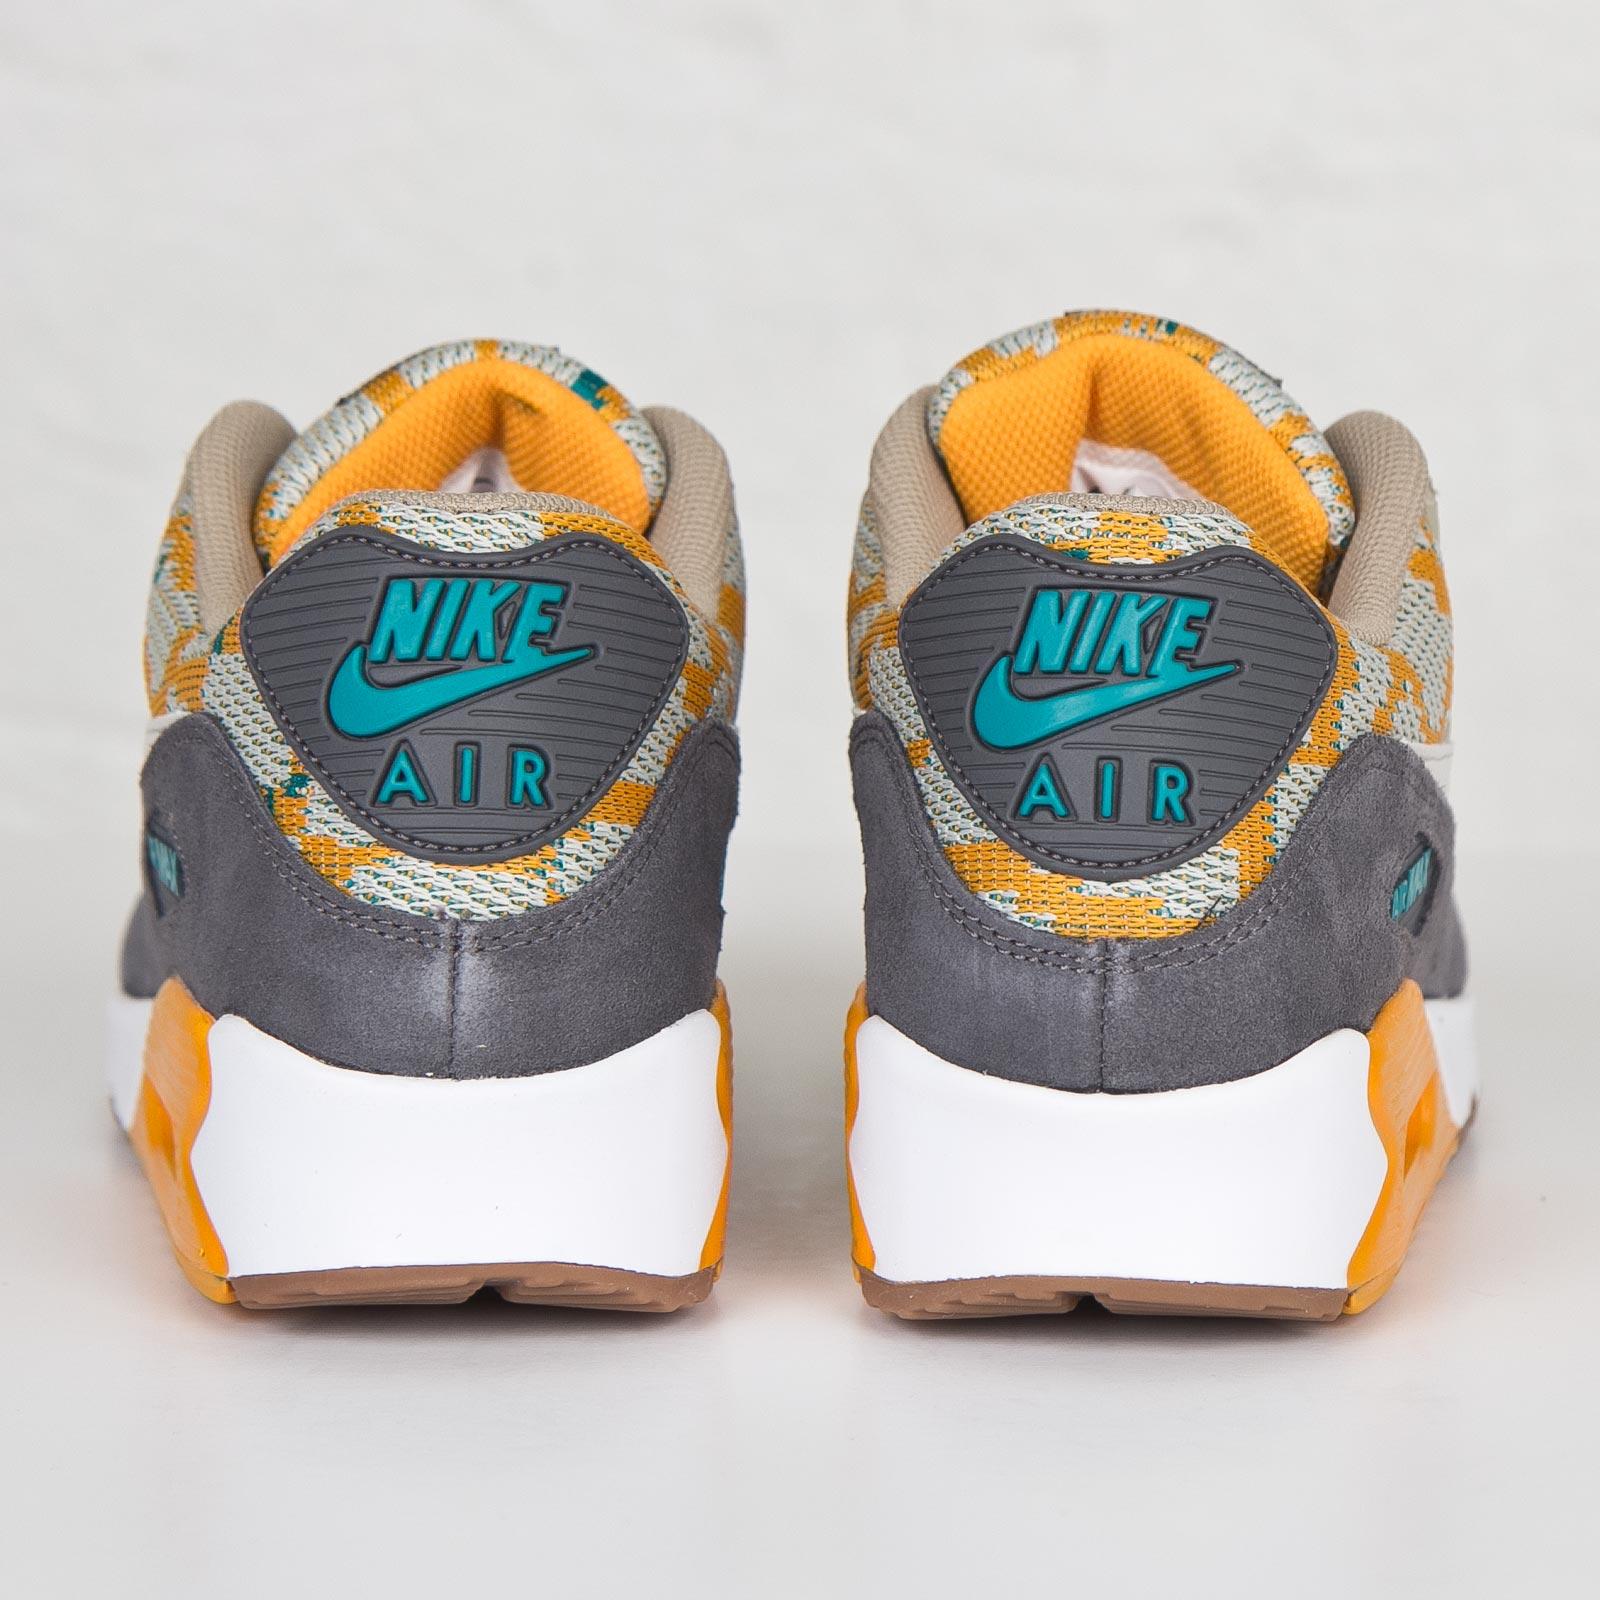 brand new 5021e 1d8a5 Nike Air Max 90 PA - 749674-700 - Sneakersnstuff   sneakers   streetwear  online since 1999